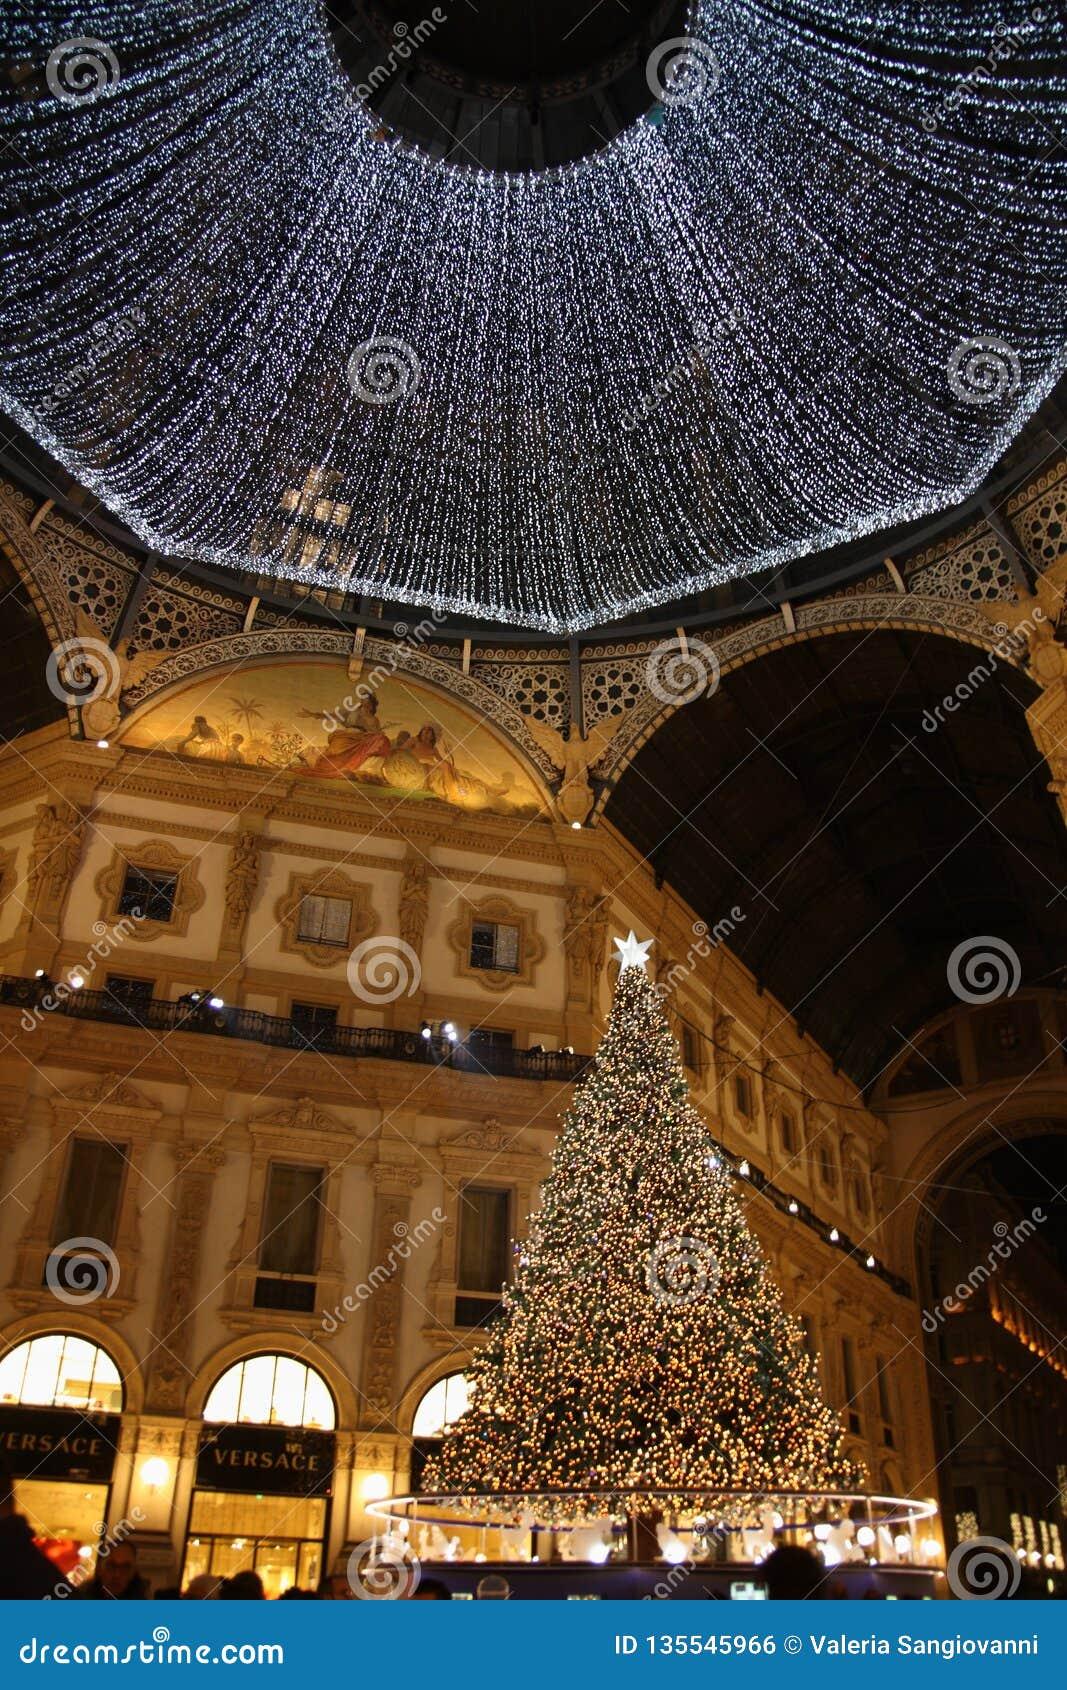 Christmas 2018 Milan Galleria Vittorio Emanuele Ii Swarovski